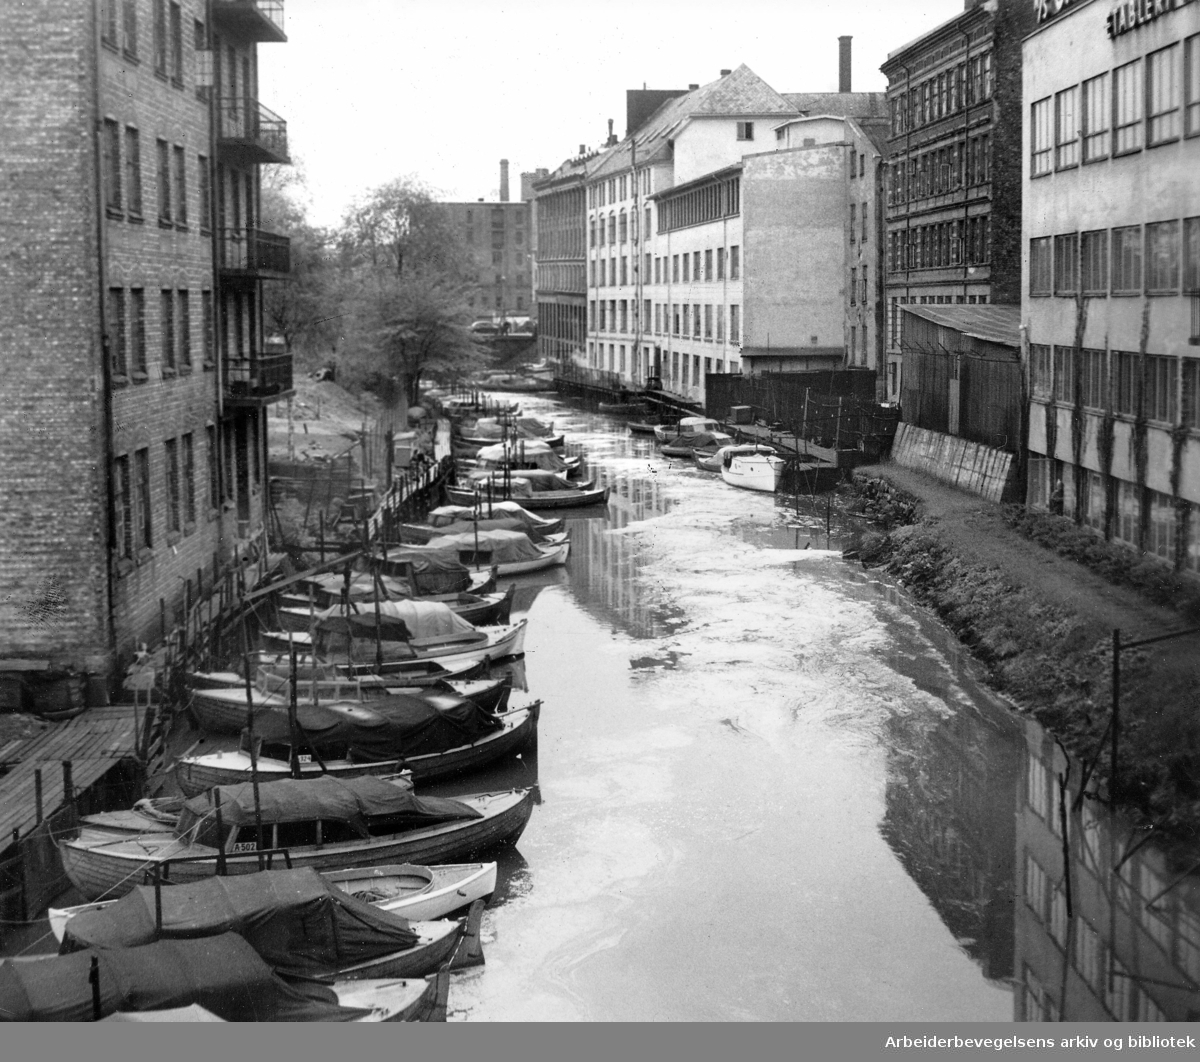 Akerselva båtforening ved Grønland, mai 1953.